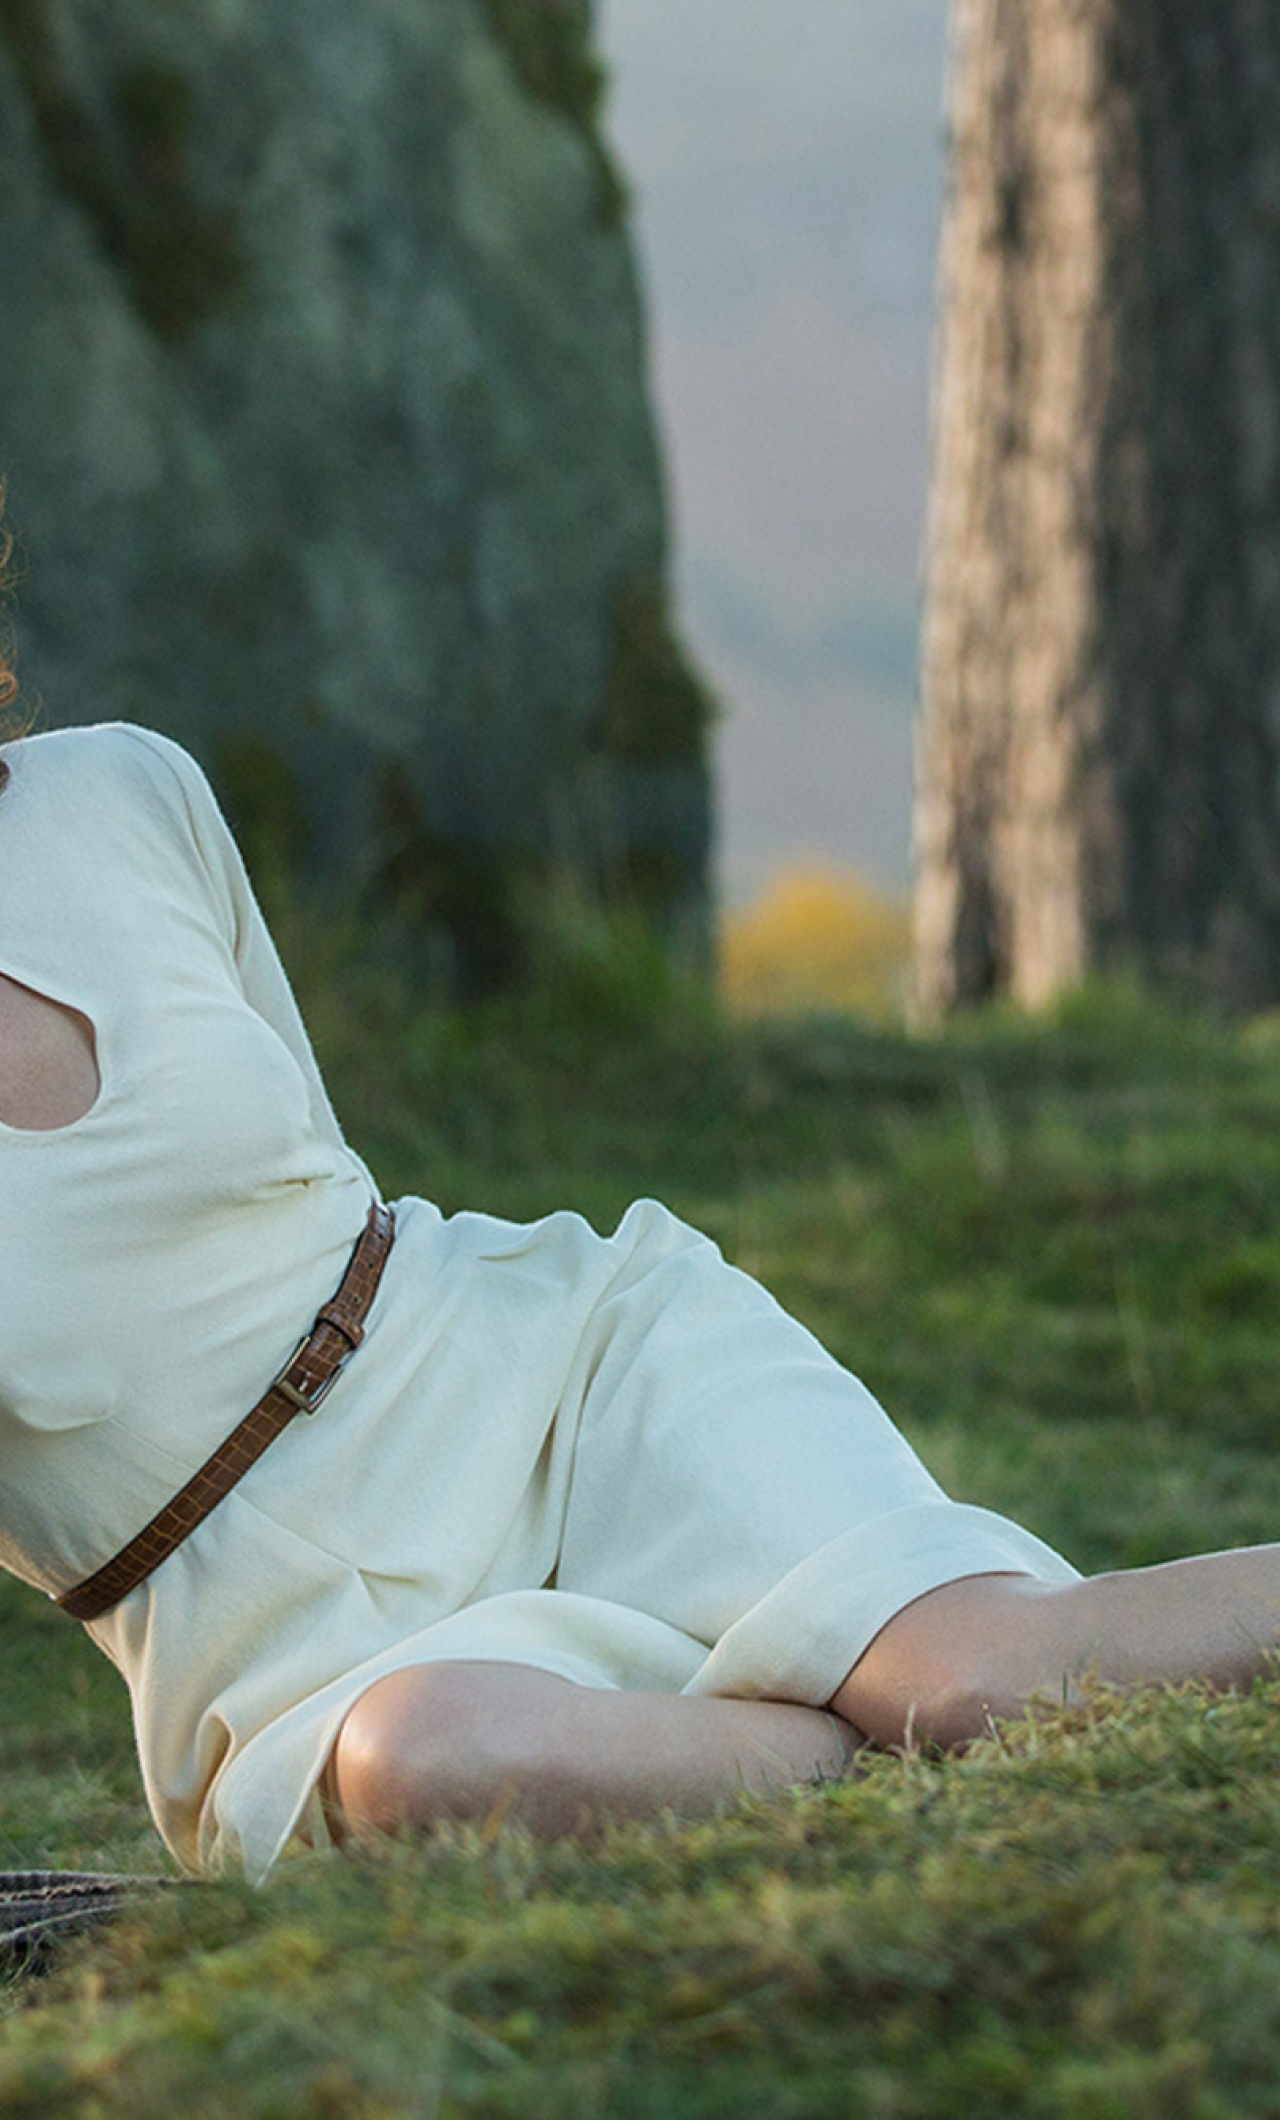 Outlander Actress Caitriona Balfe, Full HD 2K Wallpaper